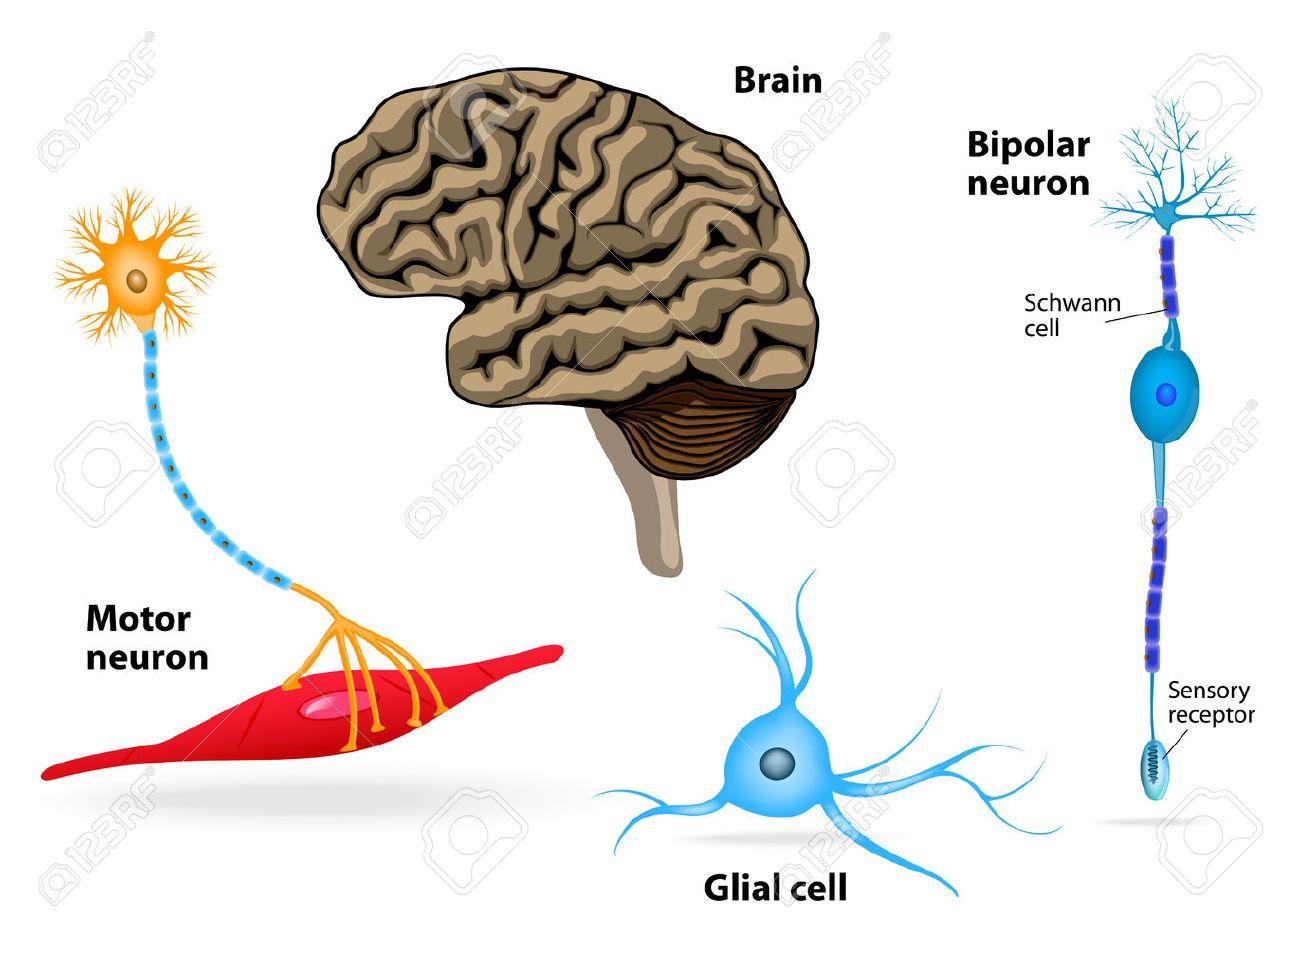 hight resolution of nervous system human anatomy brain motor neuron glial and schwann cell